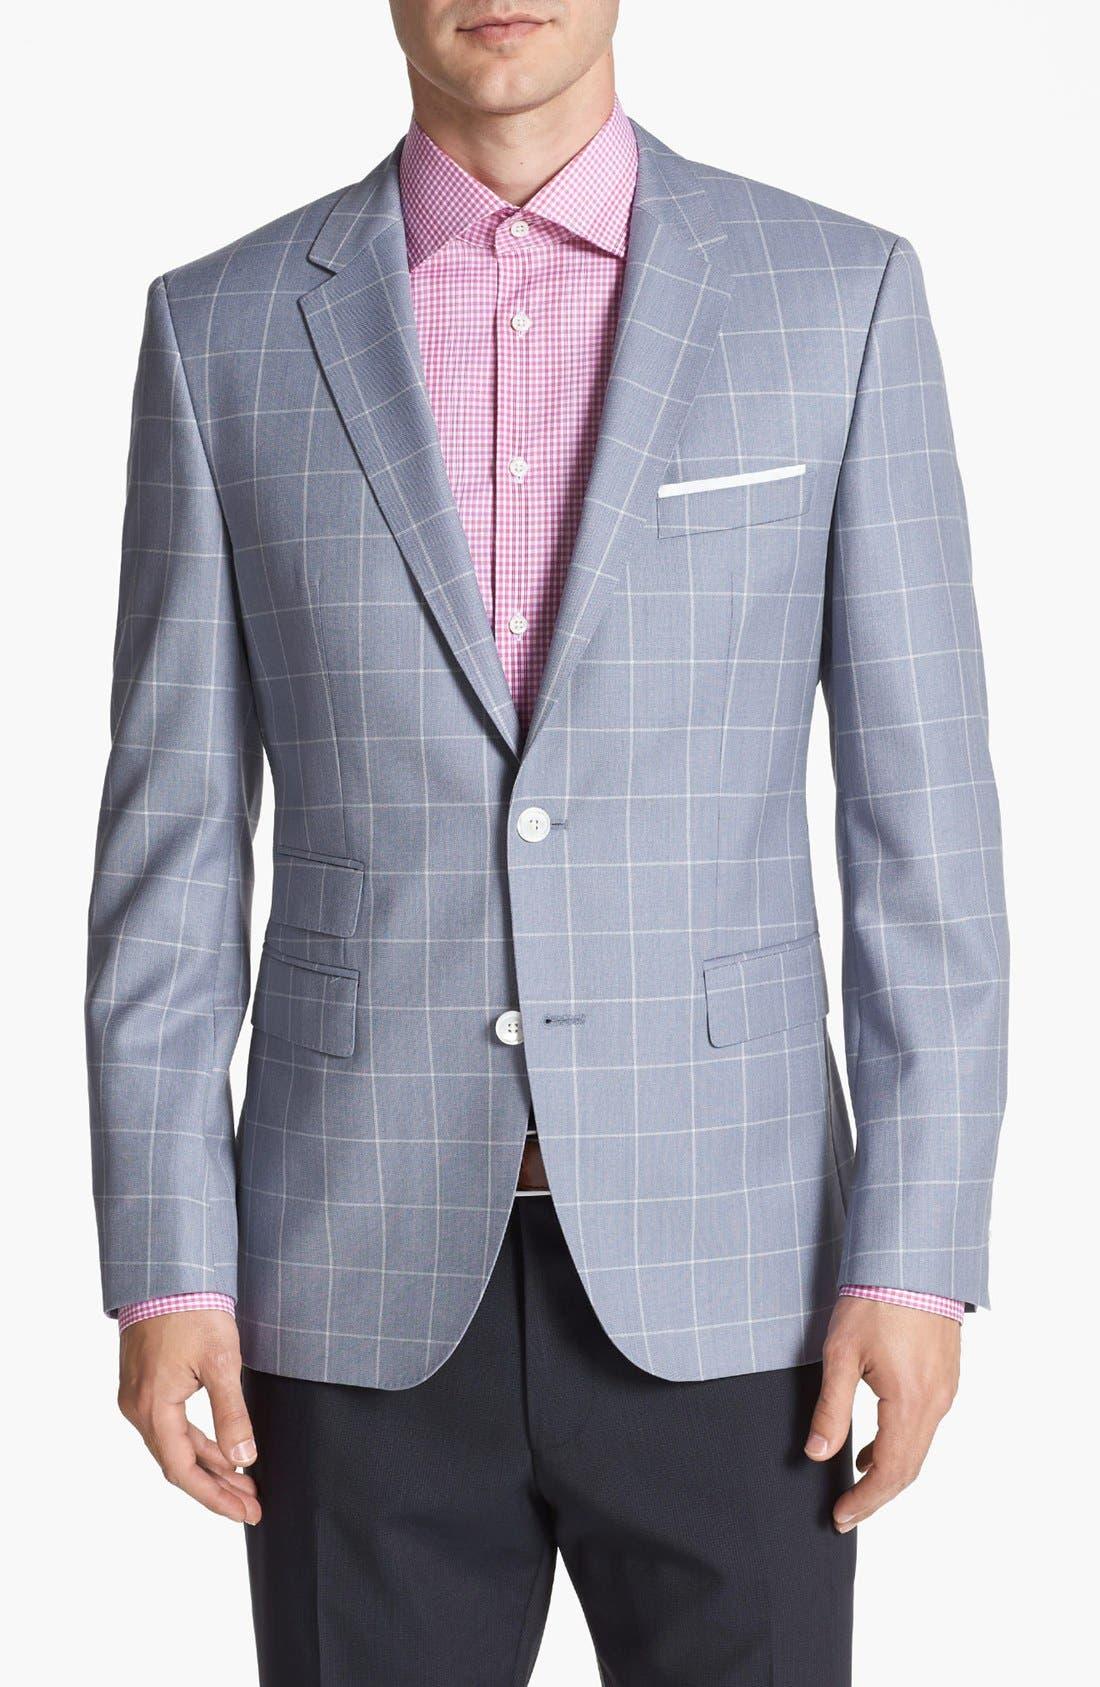 Main Image - BOSS HUGO BOSS 'Sweet' Trim Fit Plaid Sportcoat